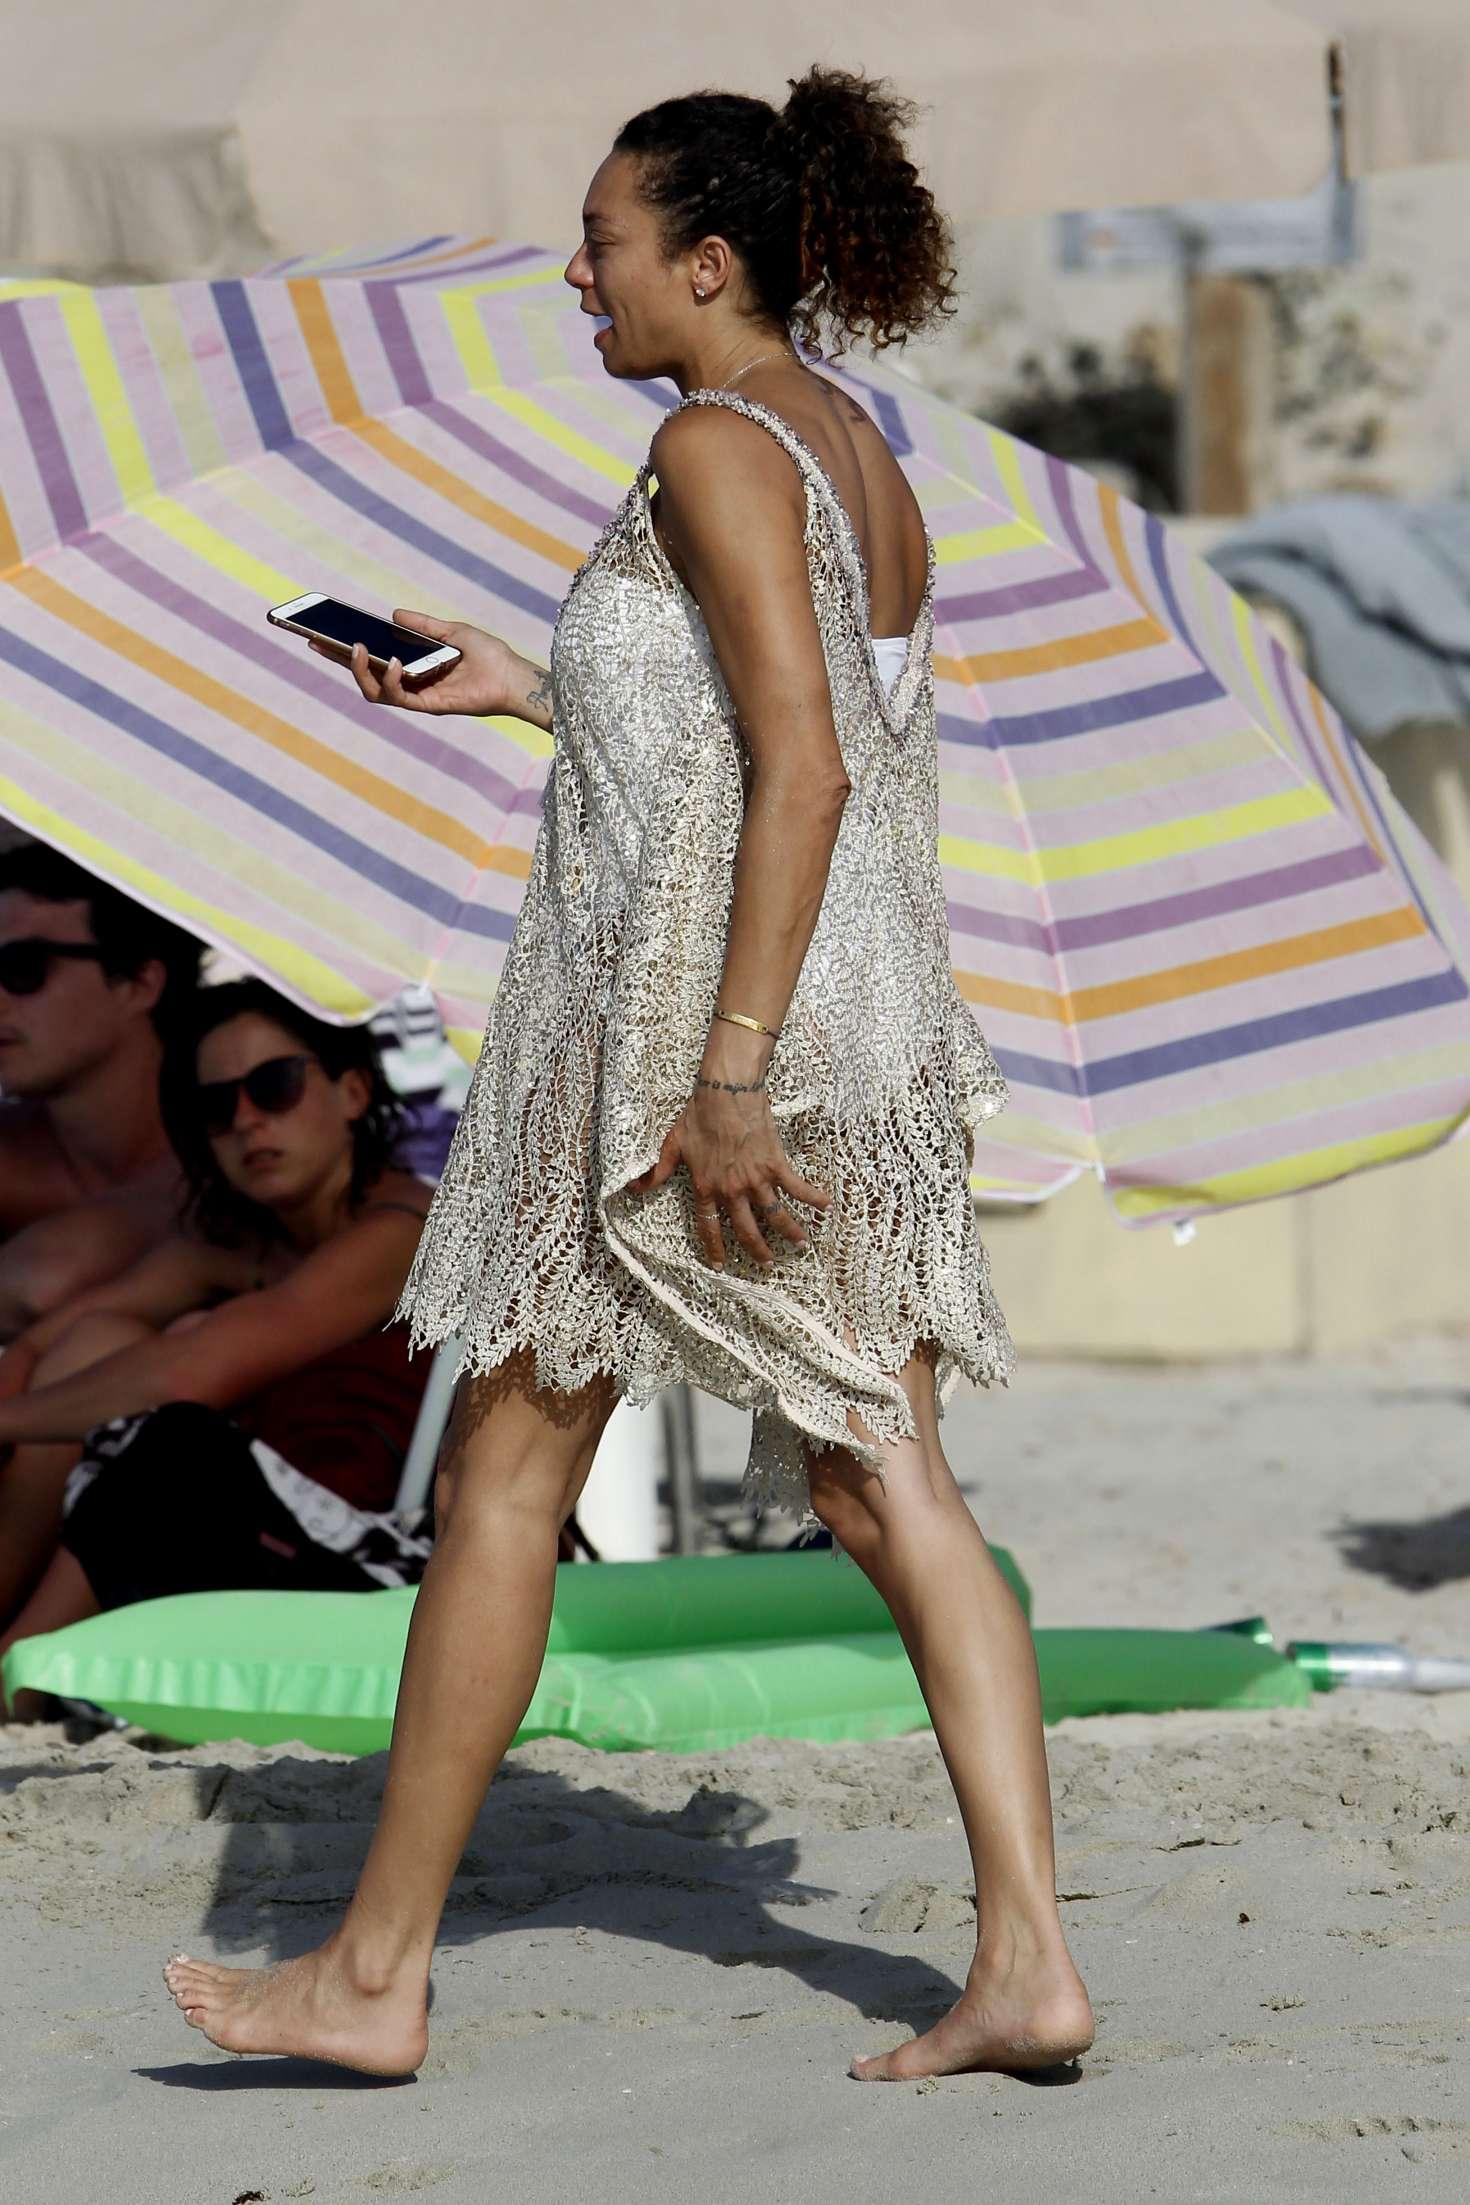 Feet Lilly Becker nude (95 foto and video), Topless, Bikini, Selfie, panties 2018